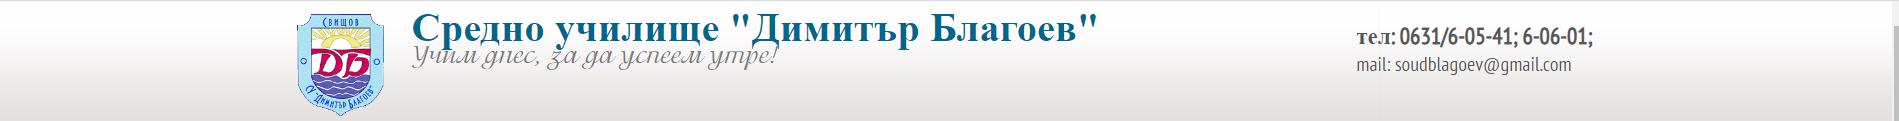 "СУ ""Д. Благоев""  – гр. Свищов"